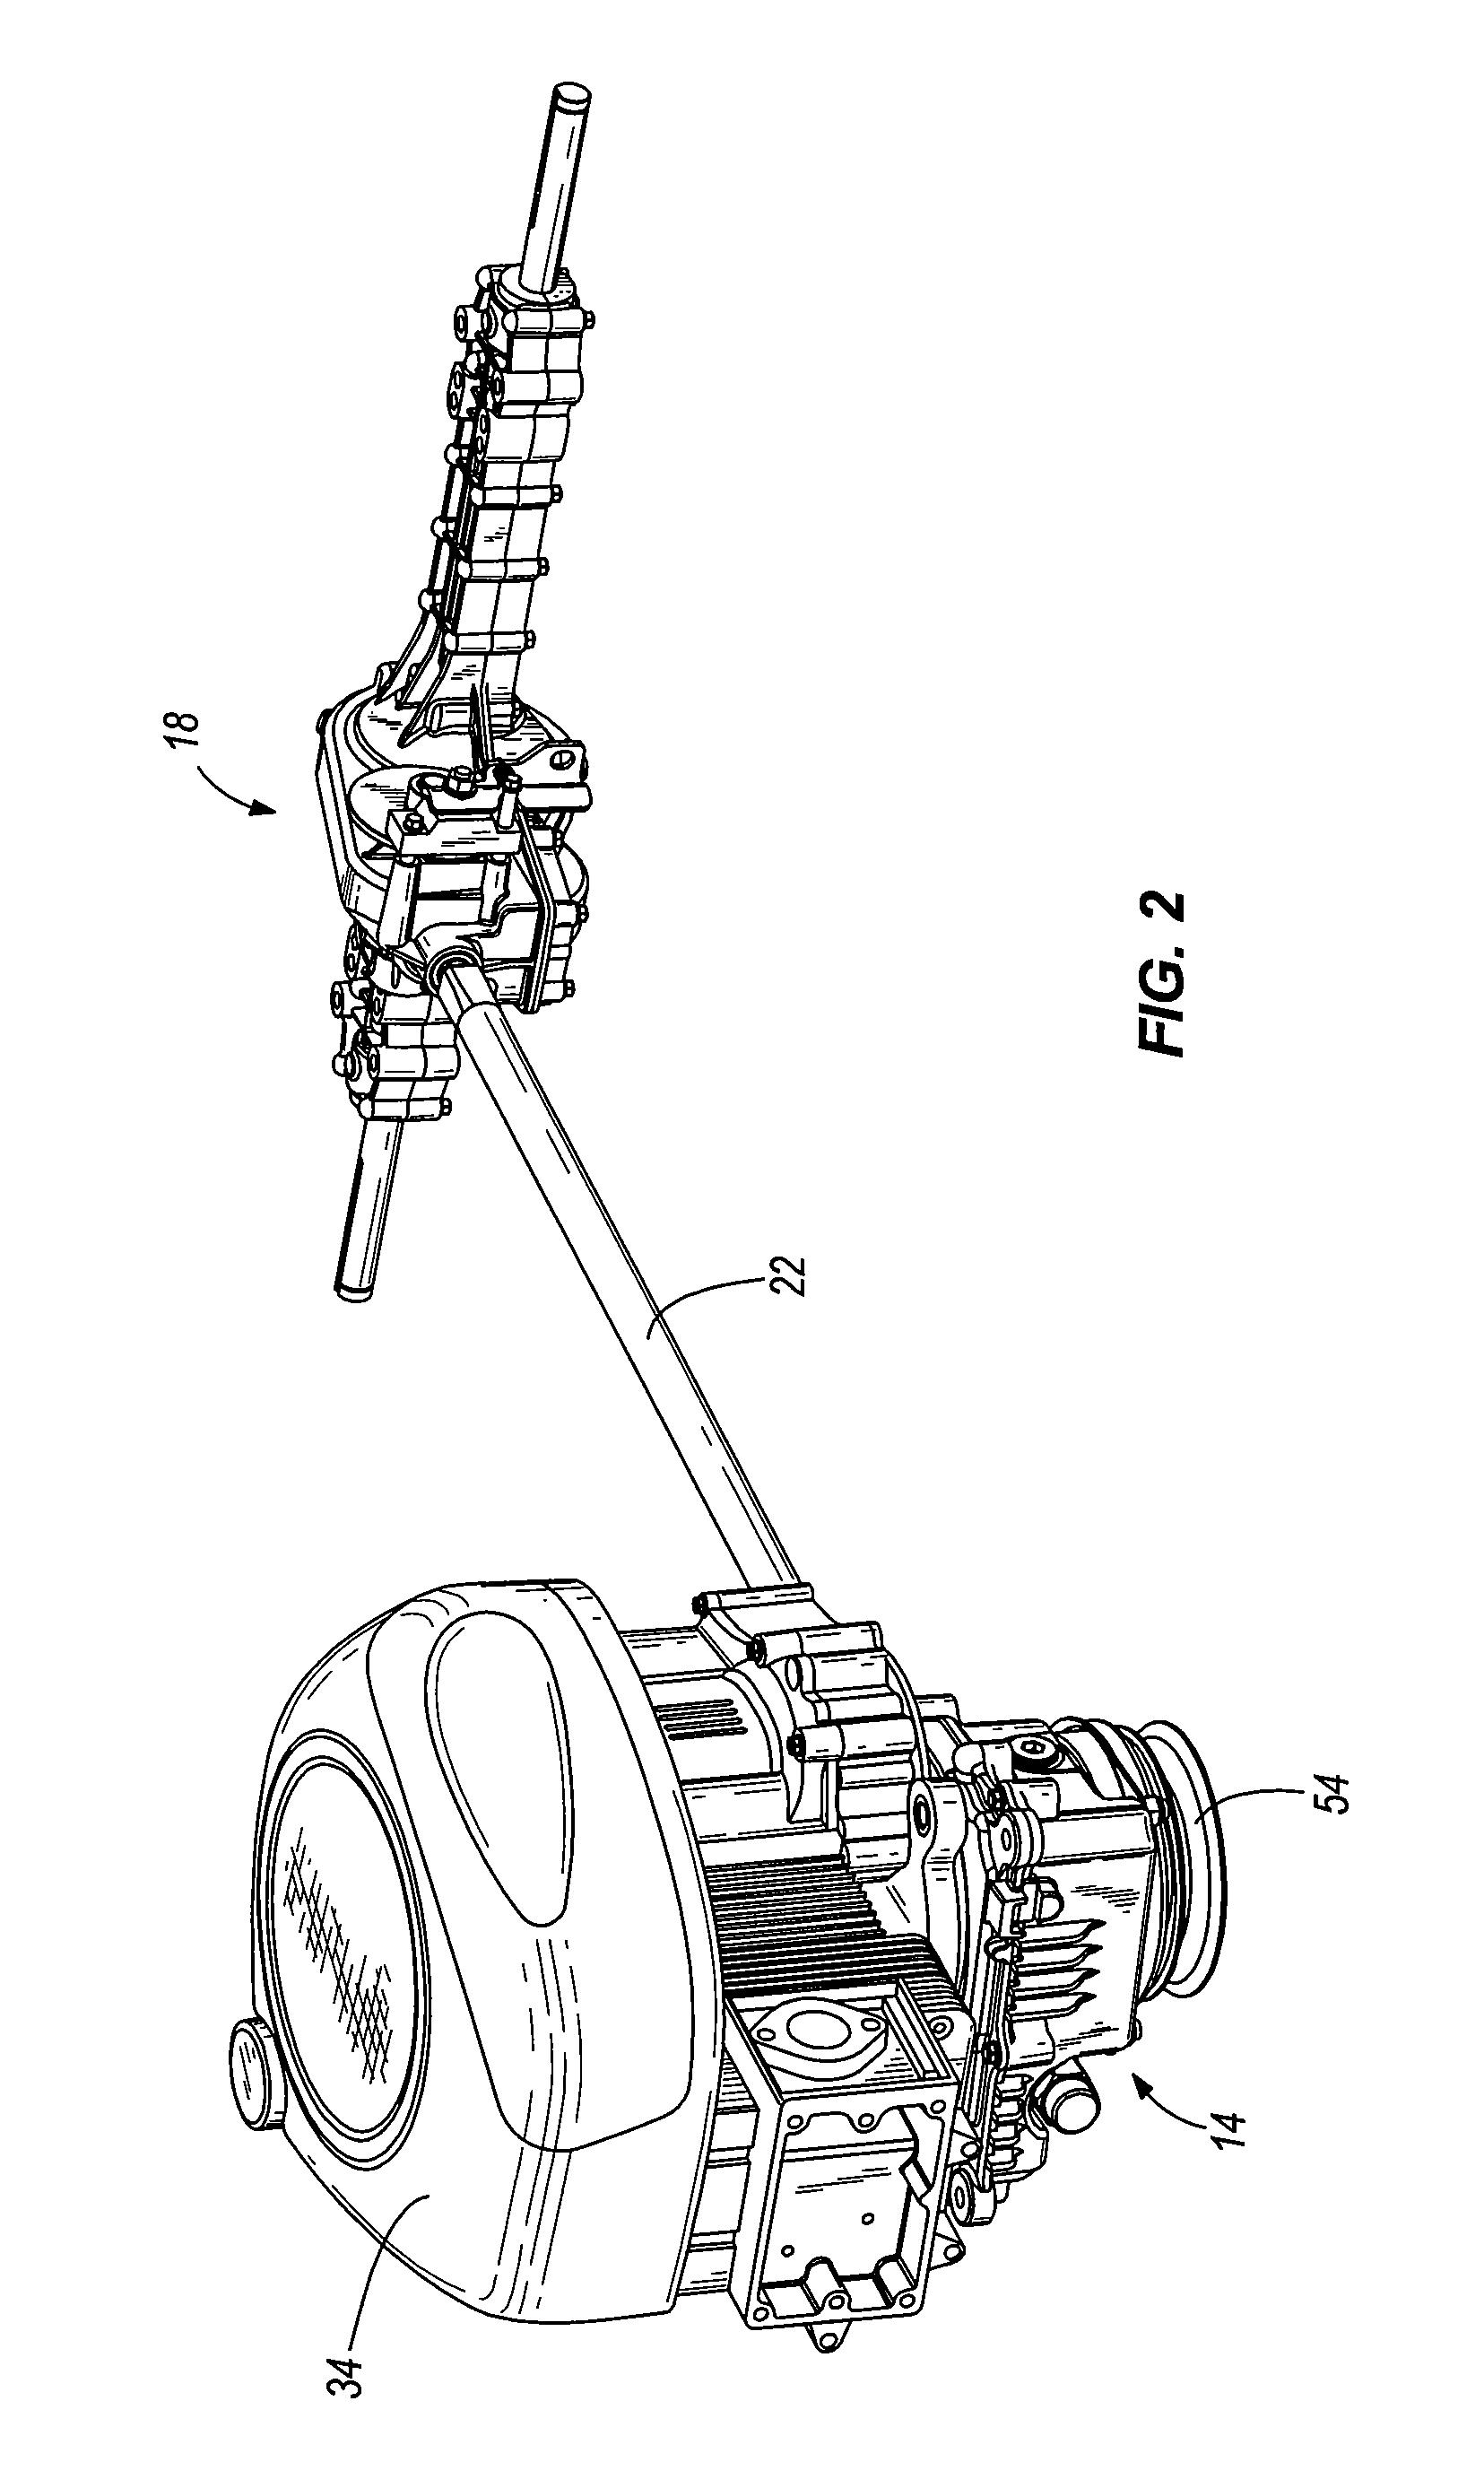 briggs and stratton transmission fluid